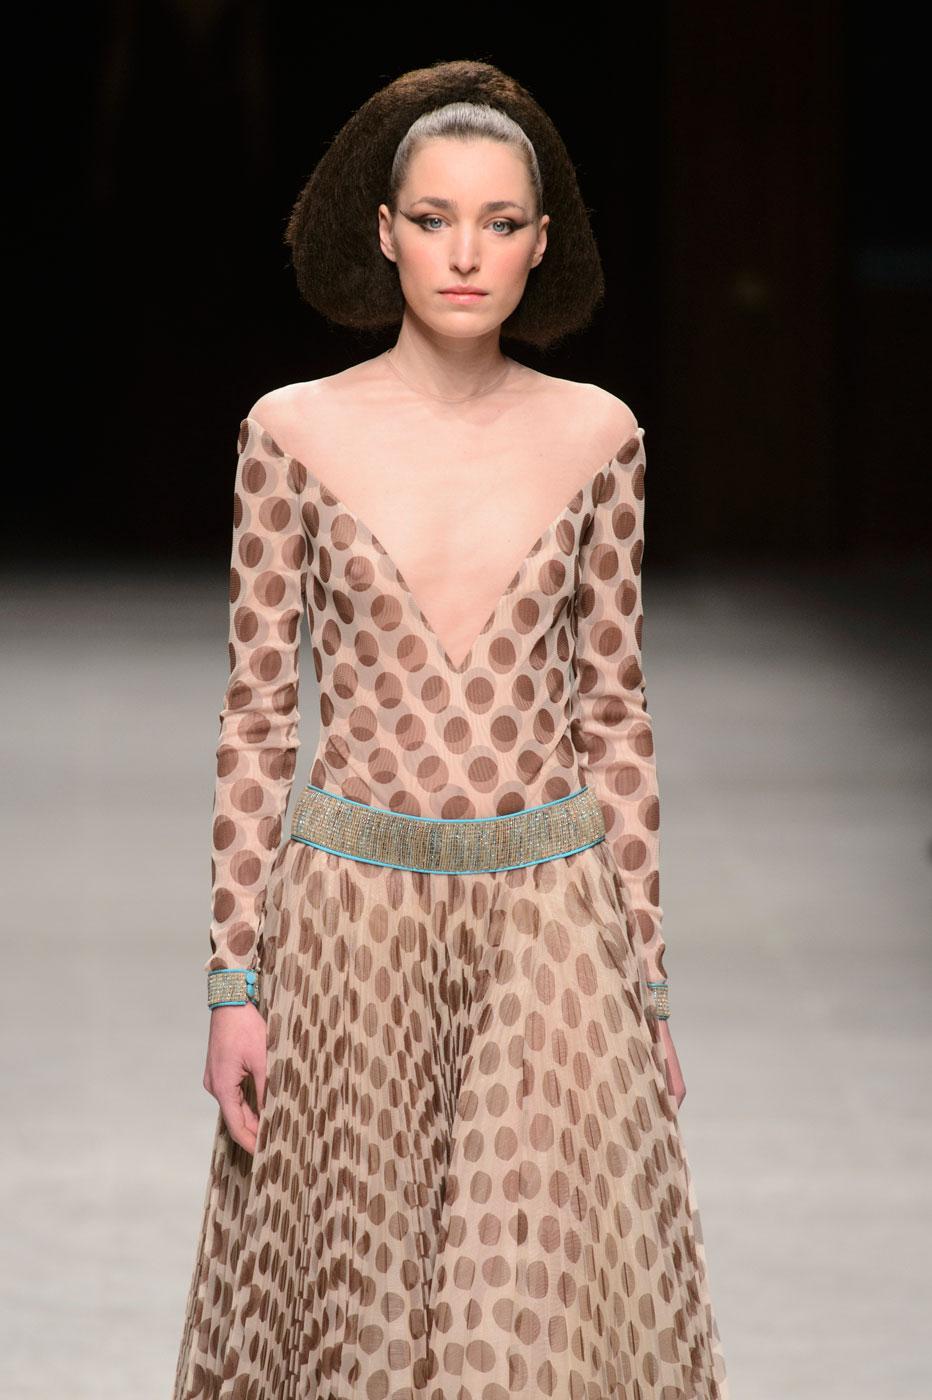 Julien-Fournie-Prive-fashion-runway-show-haute-couture-paris-spring-2015-the-impression-39